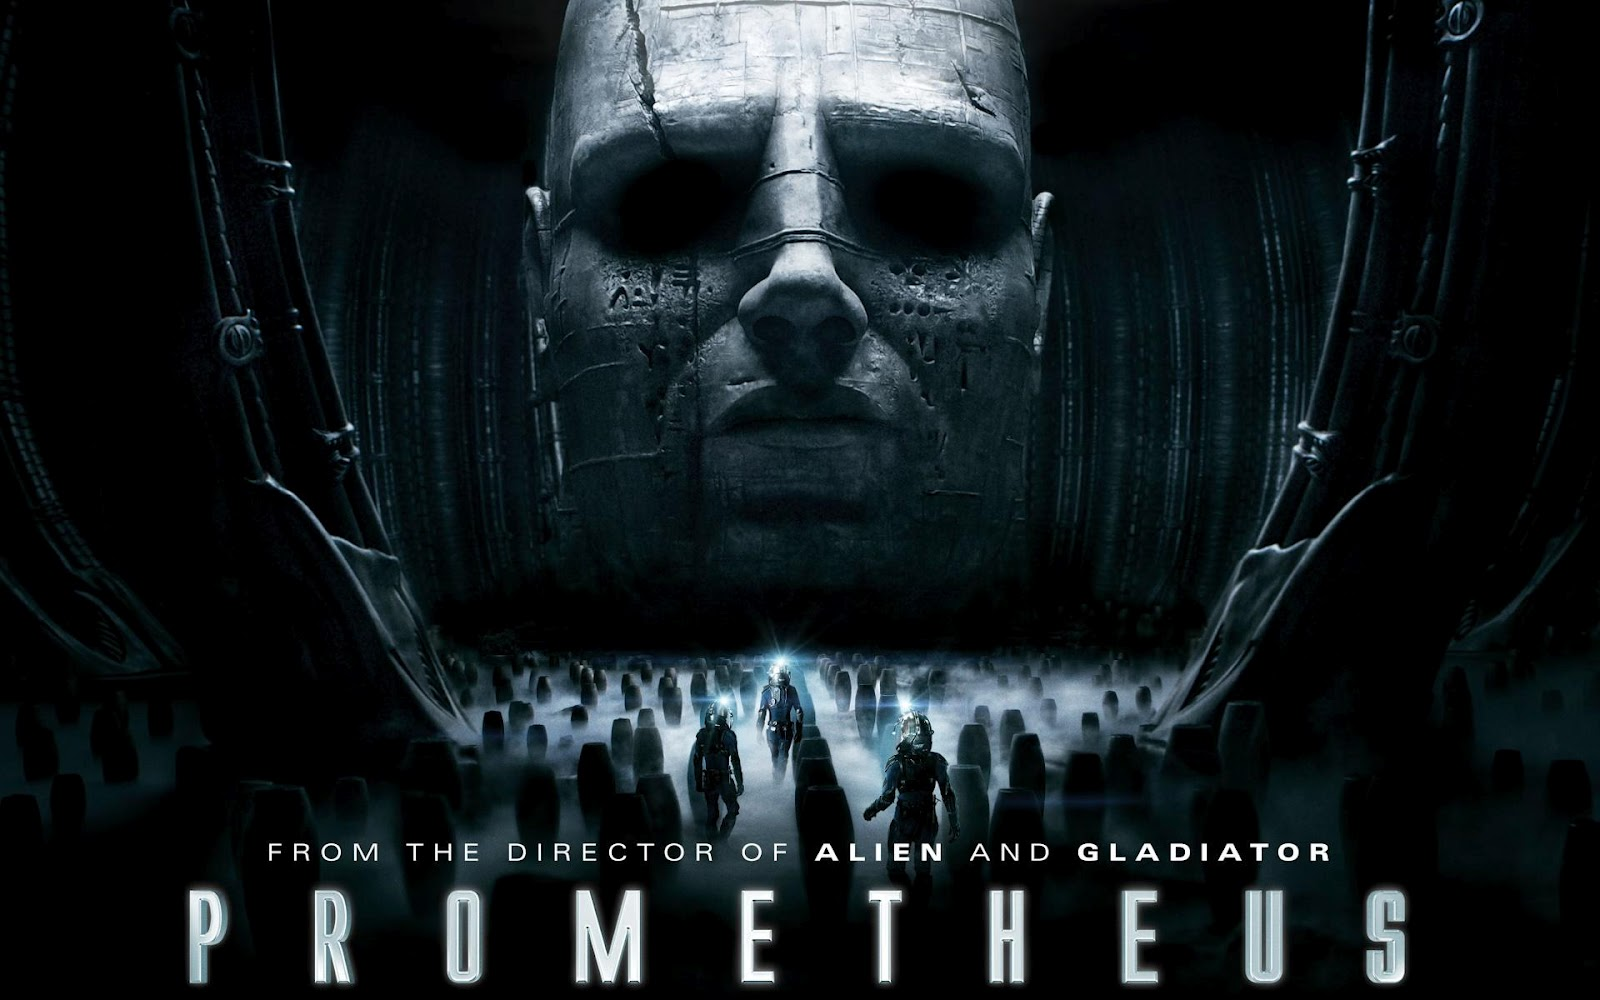 http://4.bp.blogspot.com/-6QBXbeiWZNo/T95NPdtRMoI/AAAAAAAAGnw/AWADZdXGbTY/s1600/Prometheus+cartel.JPG